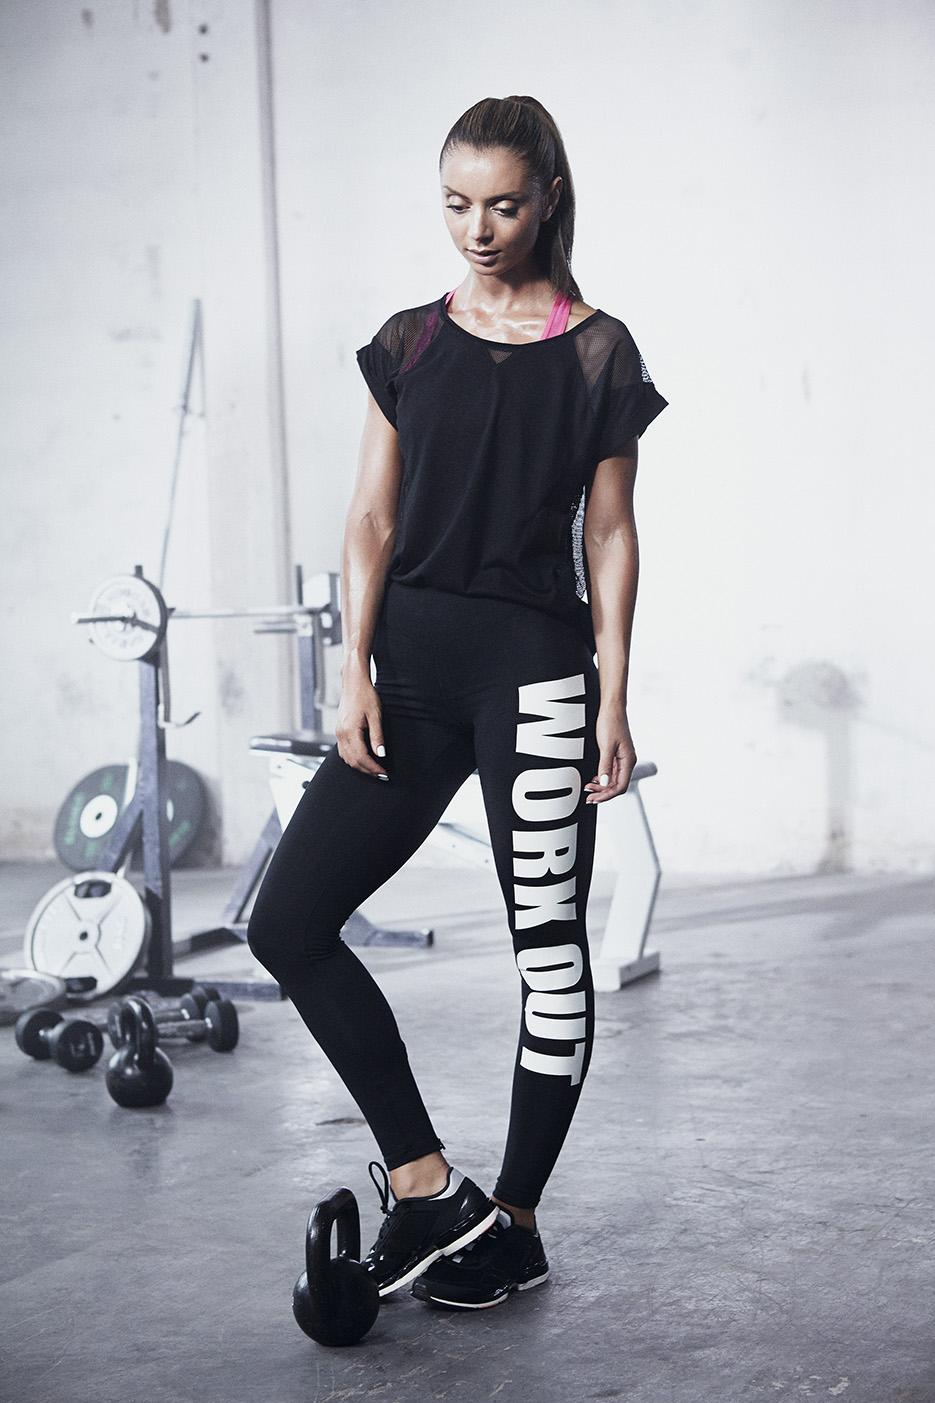 Fashionablefit1